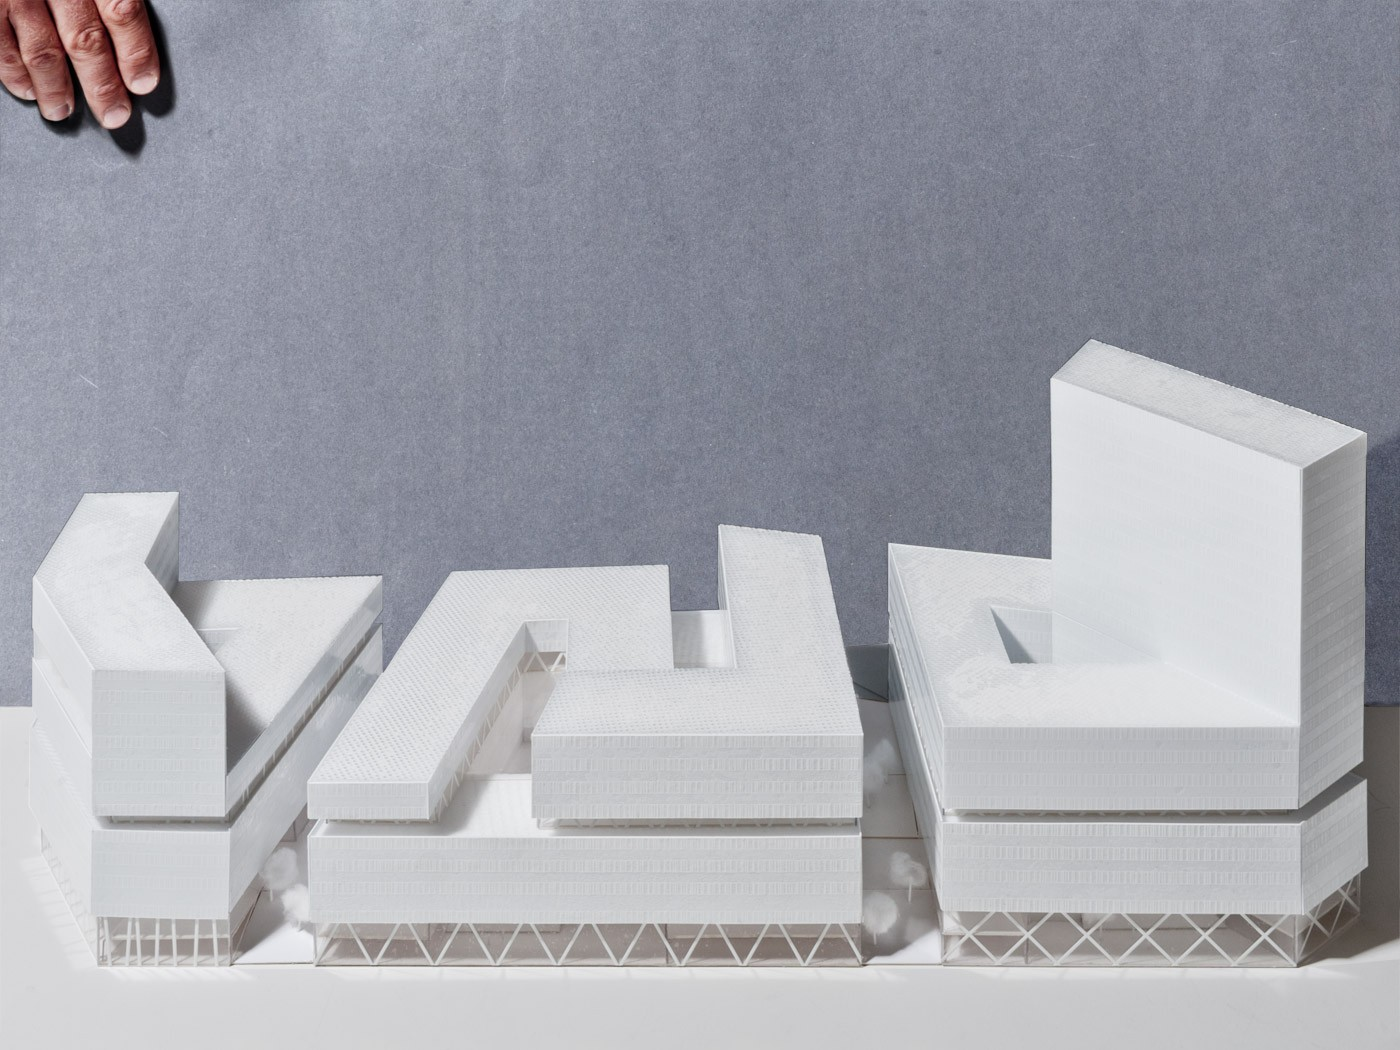 SEB_arenastaden_a_ripellino_modellfoto